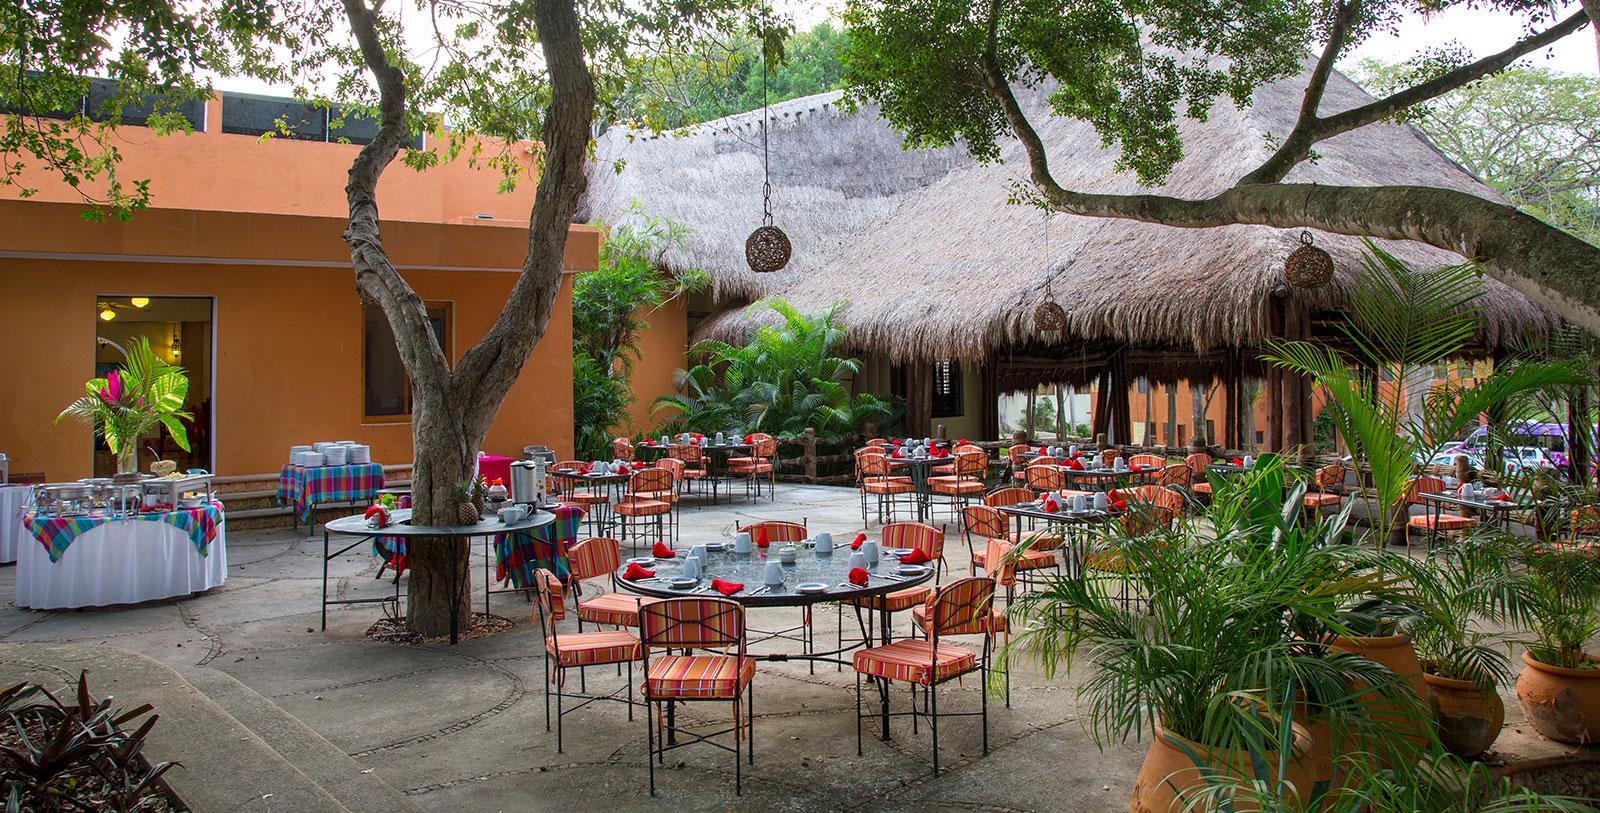 Image of Outdoor Dining, Hacienda Uxmal Plantation & Museum, Member of Historic Hotels Worldwide, Dining